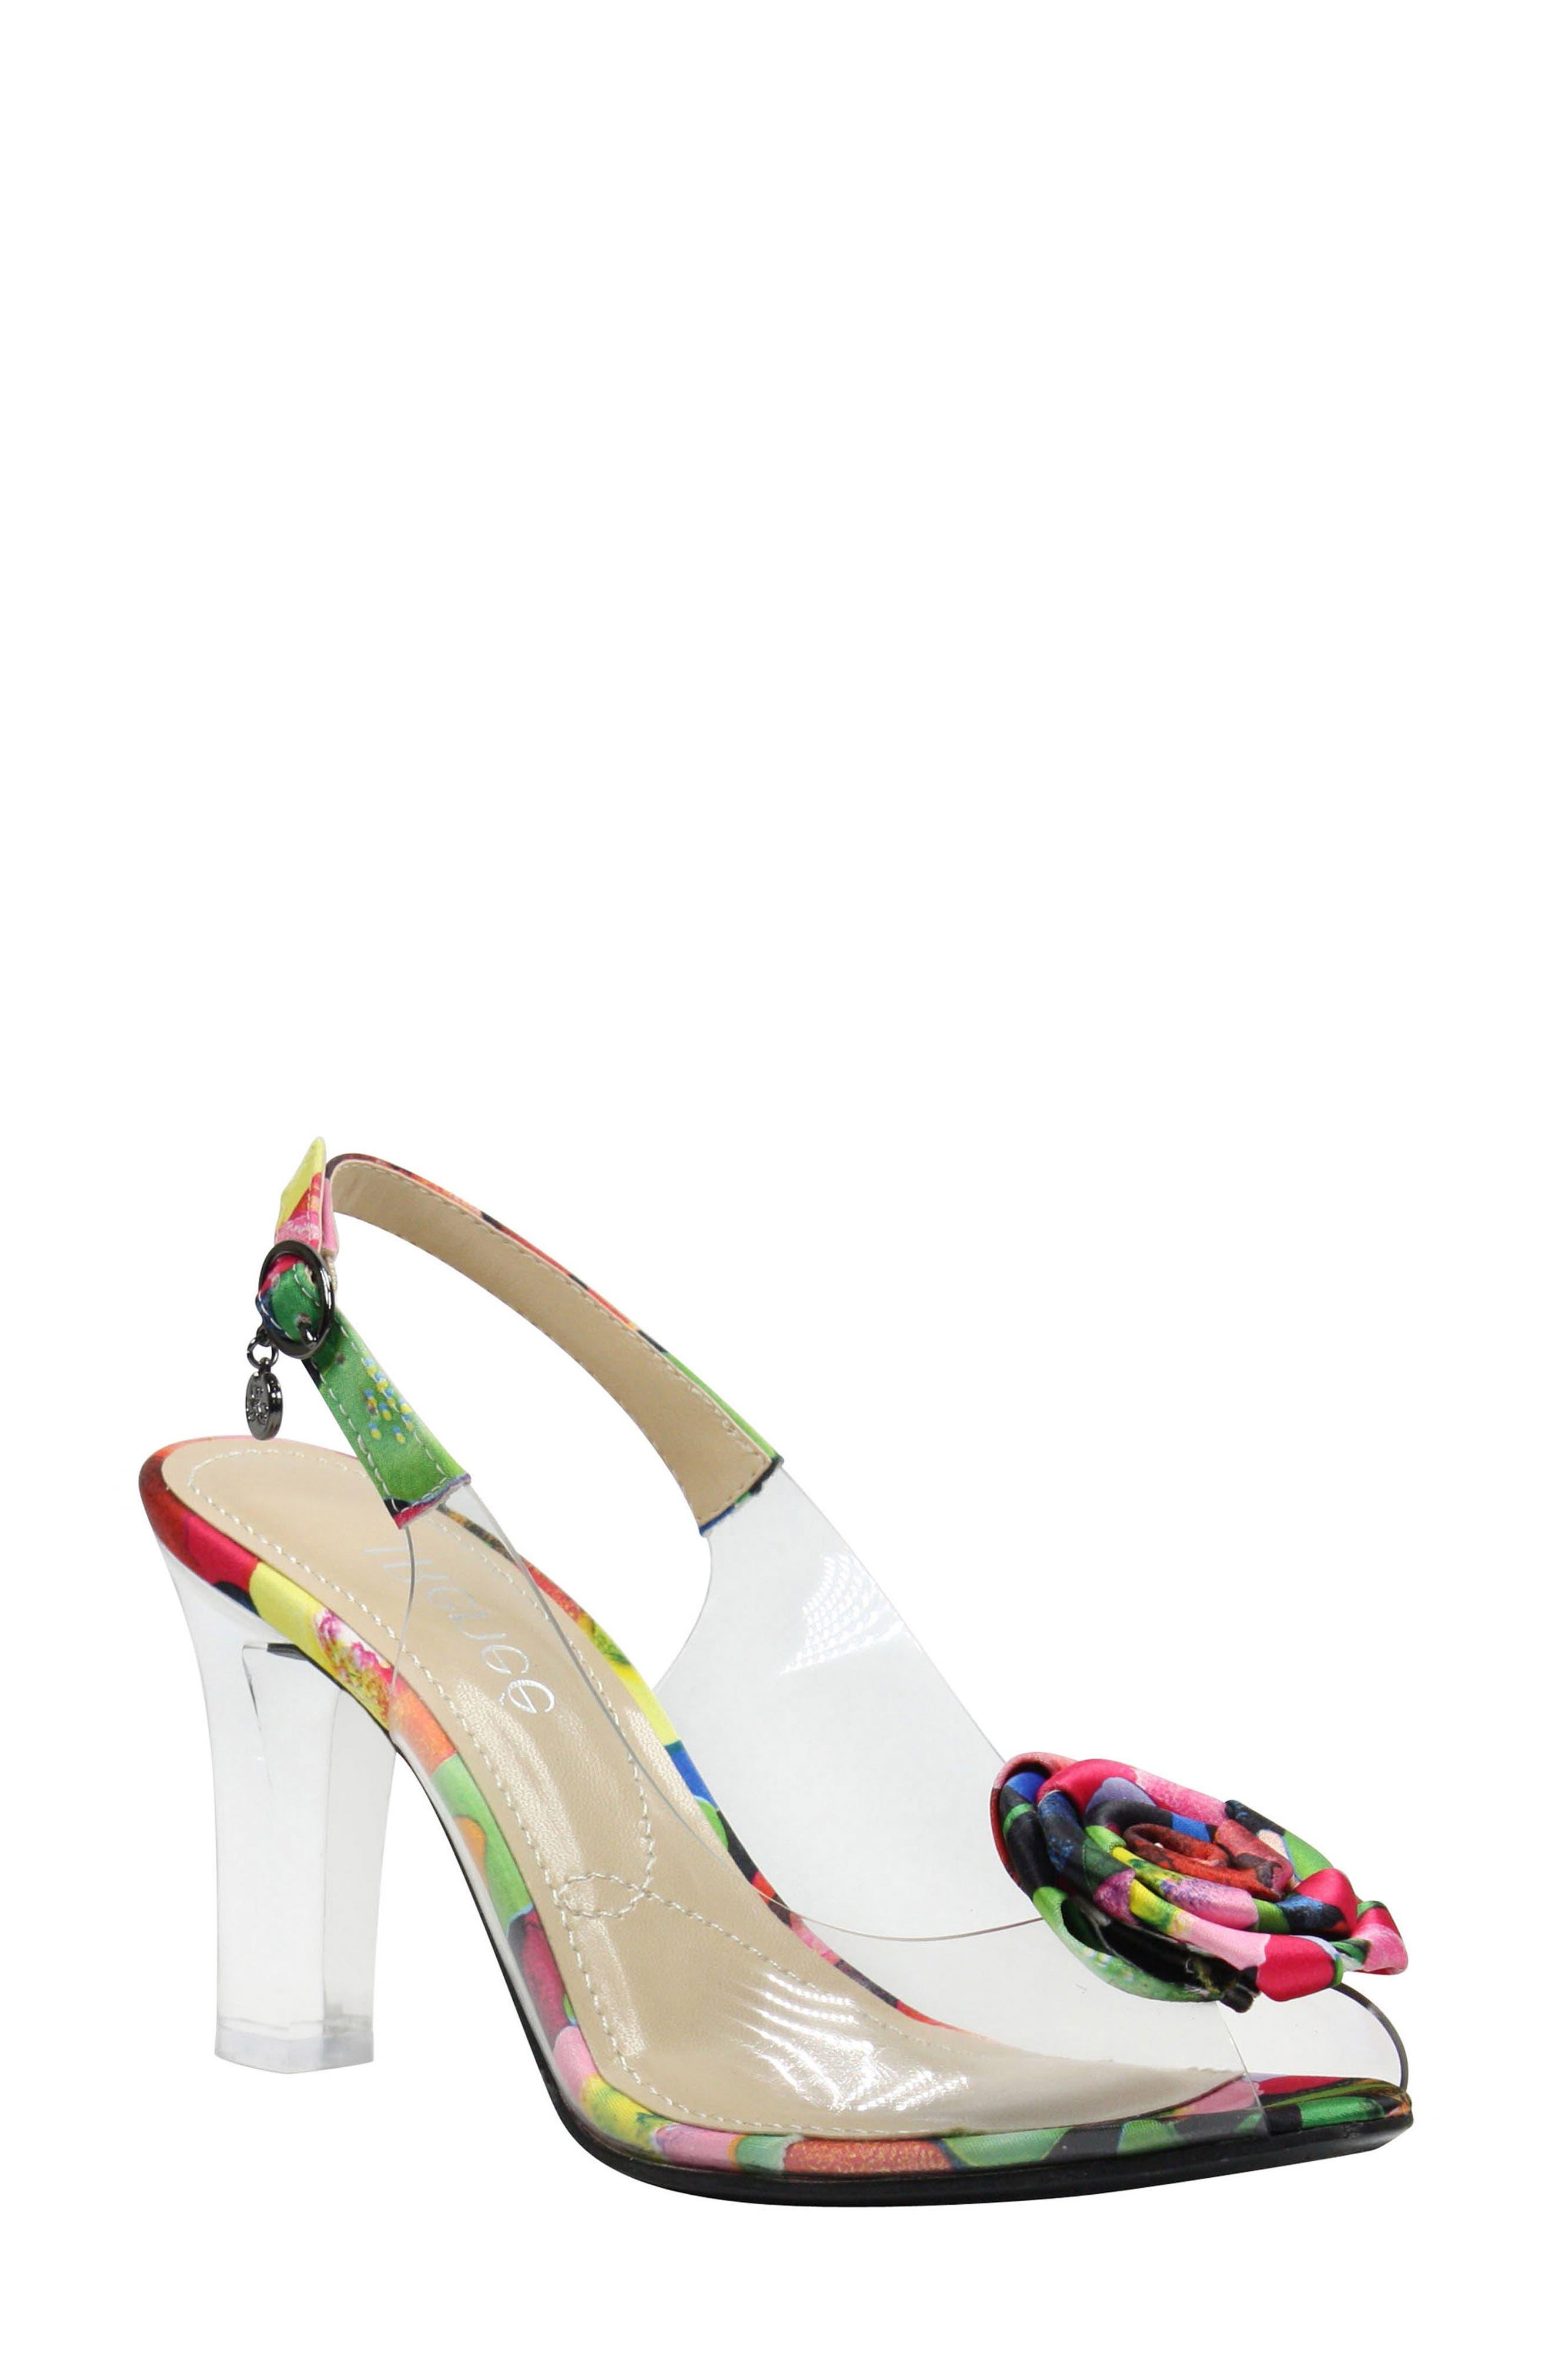 Adoracion Slingback Sandal,                         Main,                         color, Clear/ Black/ Black